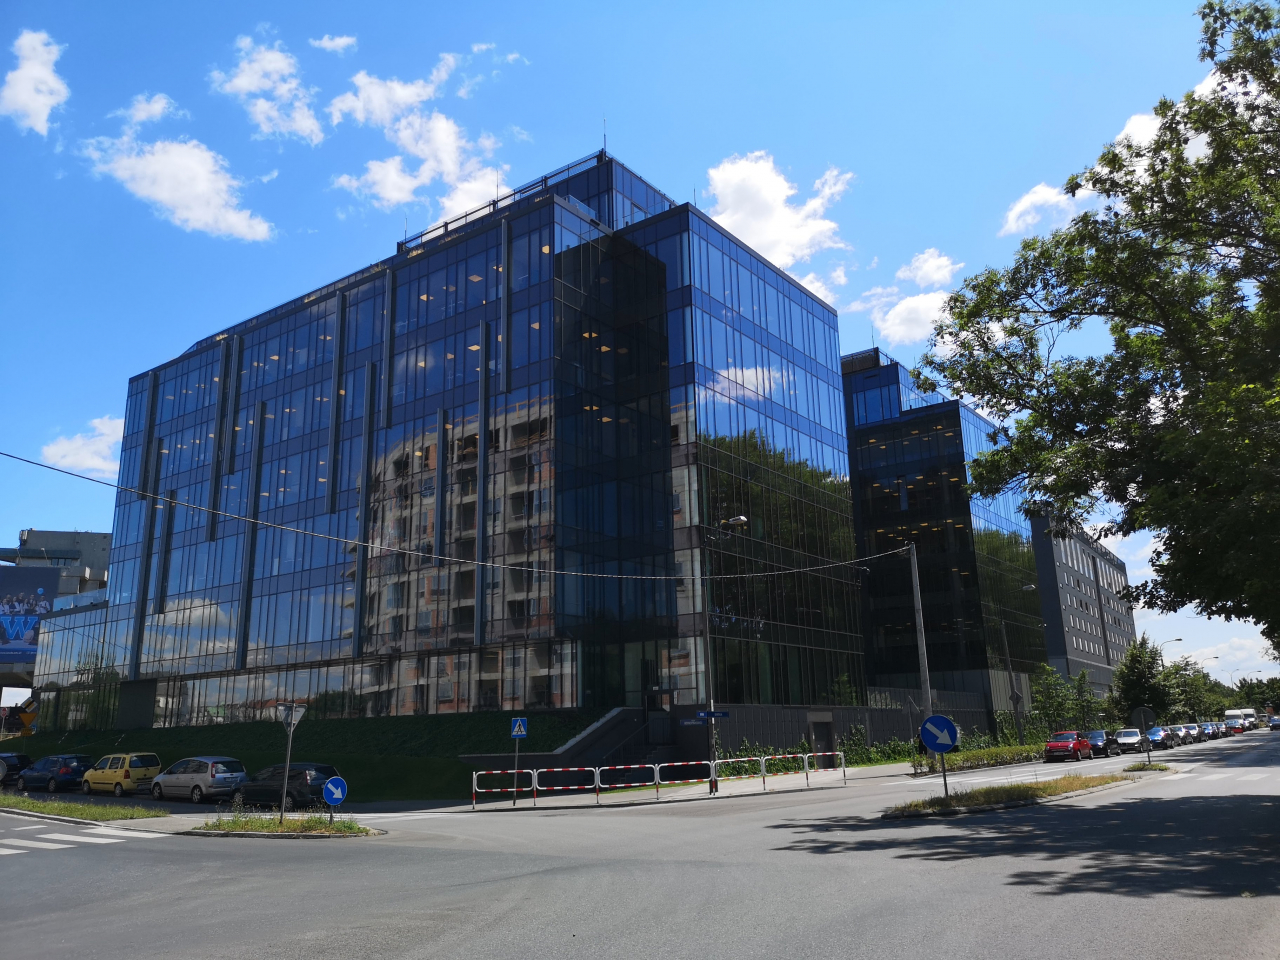 Jacobs (CH2M) Center